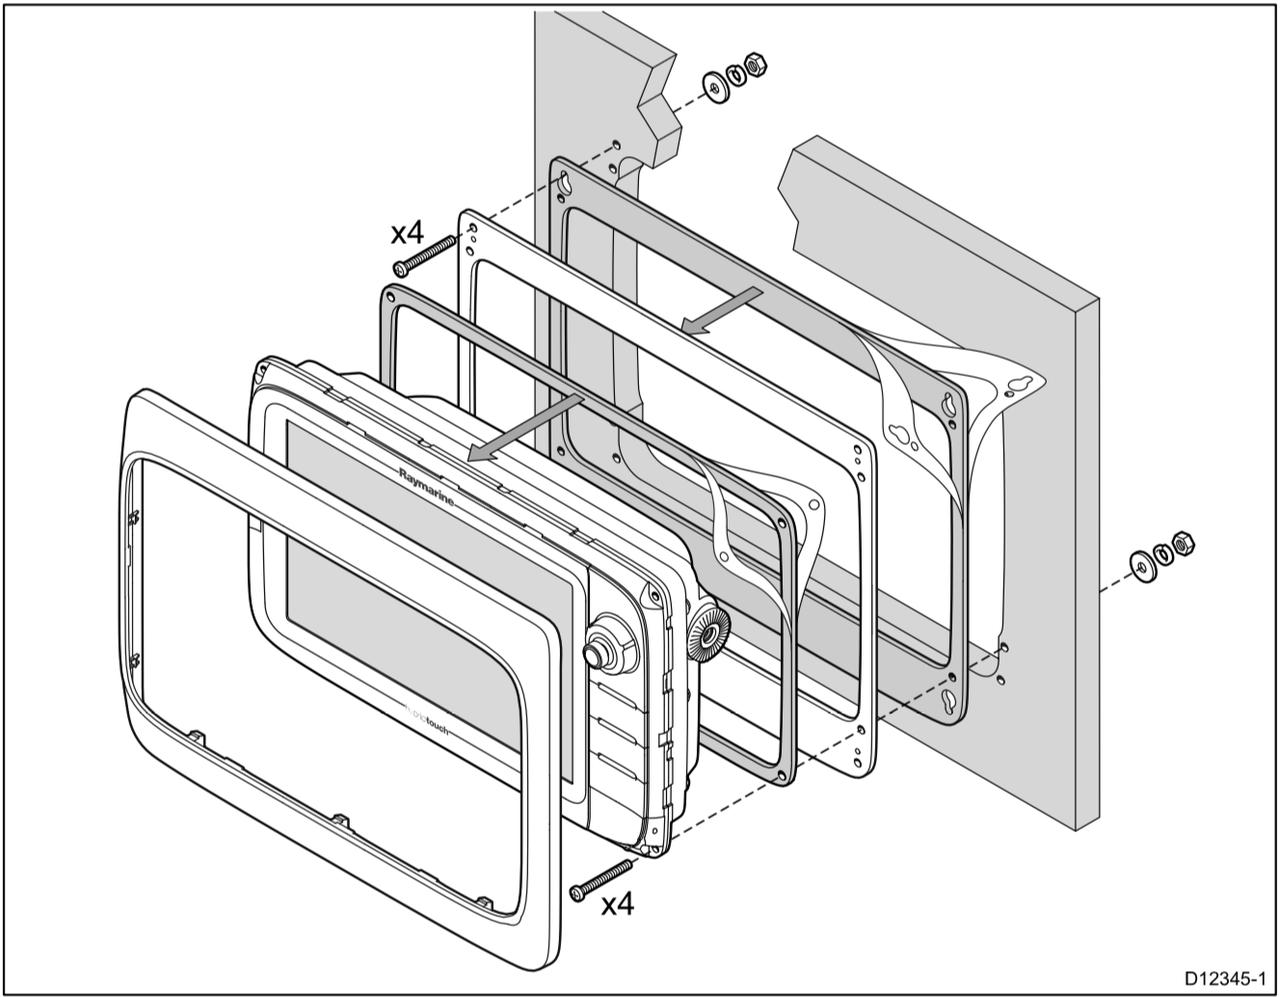 hight resolution of c80 wiring diagram wiring diagram third level c80 wiring diagram